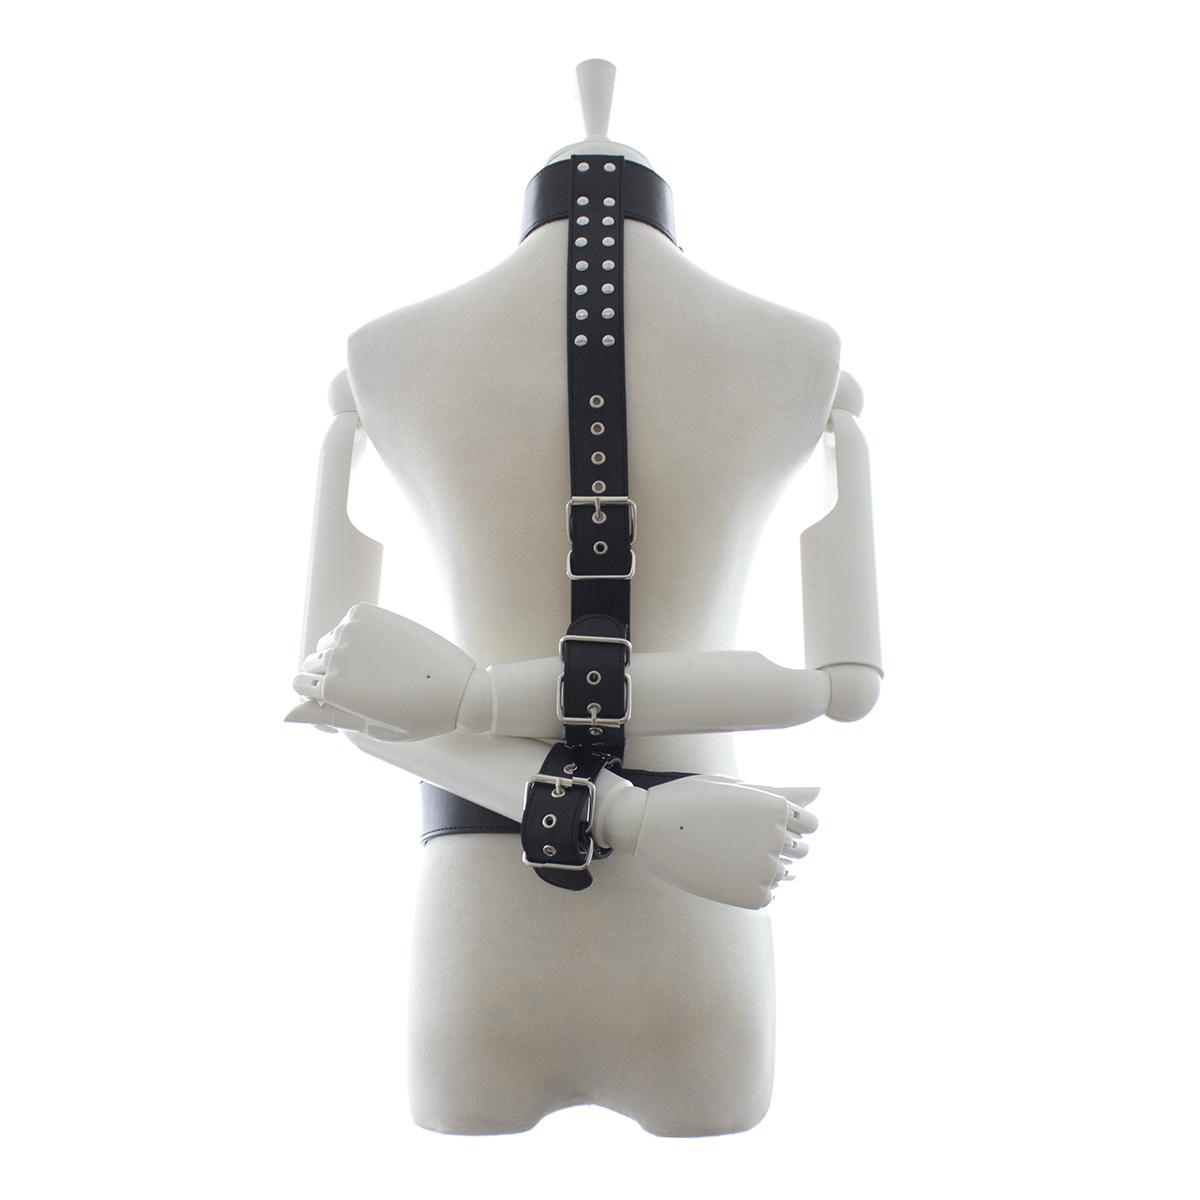 Pre Order / ของเล่นสนุกทางเลือกที่ผูกแขนบังคับใช้กับสายรัดด้านหลังใส่กุญแจมือทาส